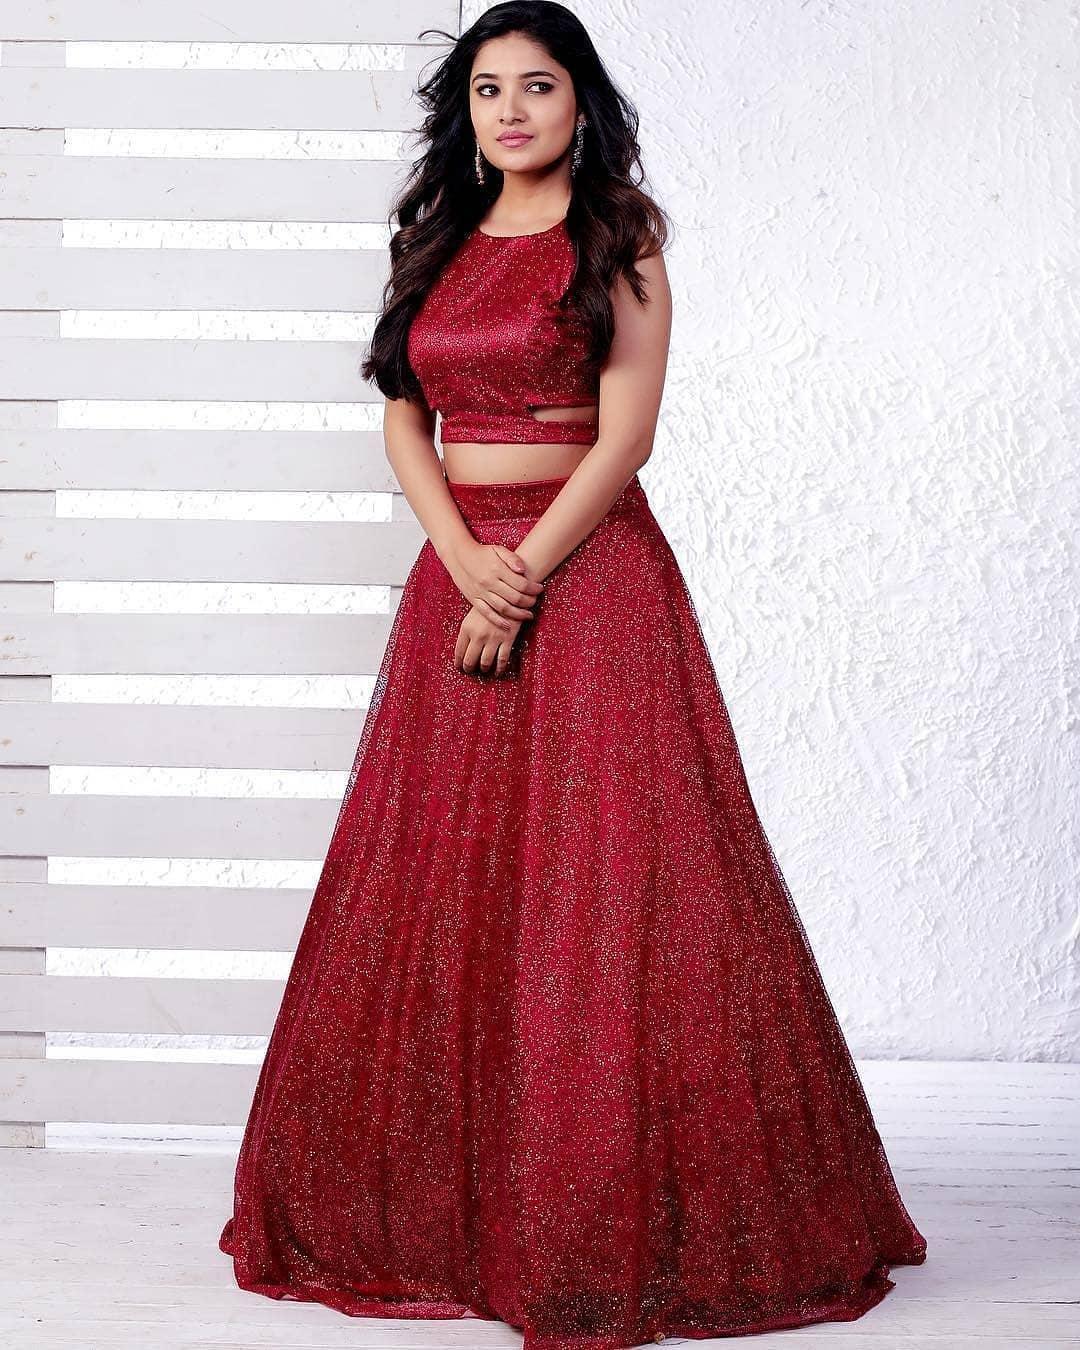 Vani Bhojan Actress Photos Stills Gallery (11)